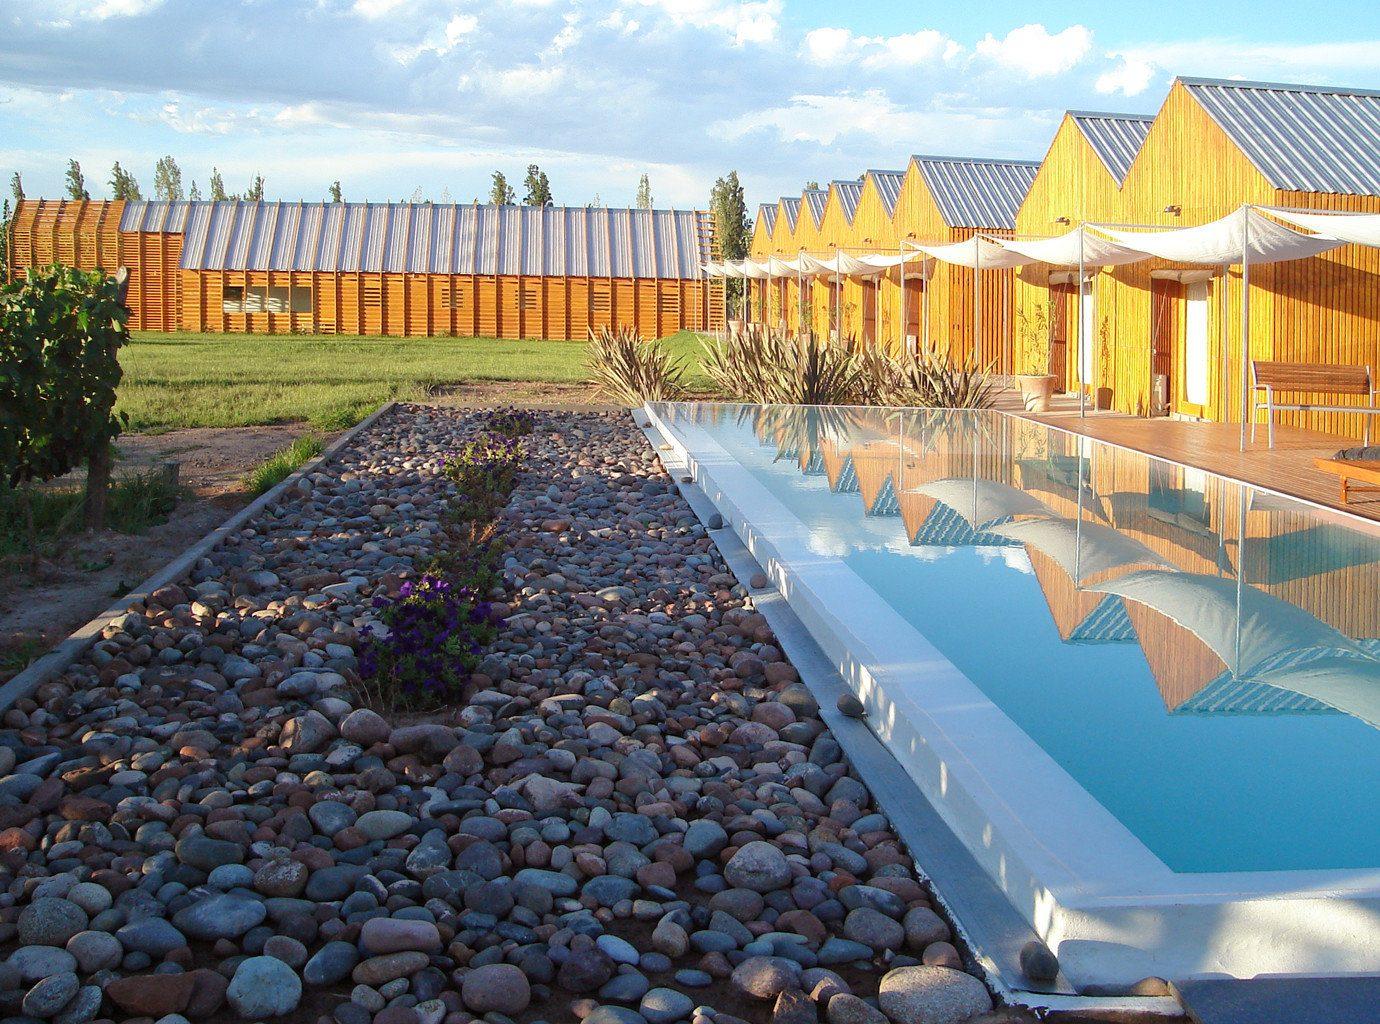 Architecture Buildings Country Design Play Pool Trip Ideas sky outdoor swimming pool walkway estate Resort backyard